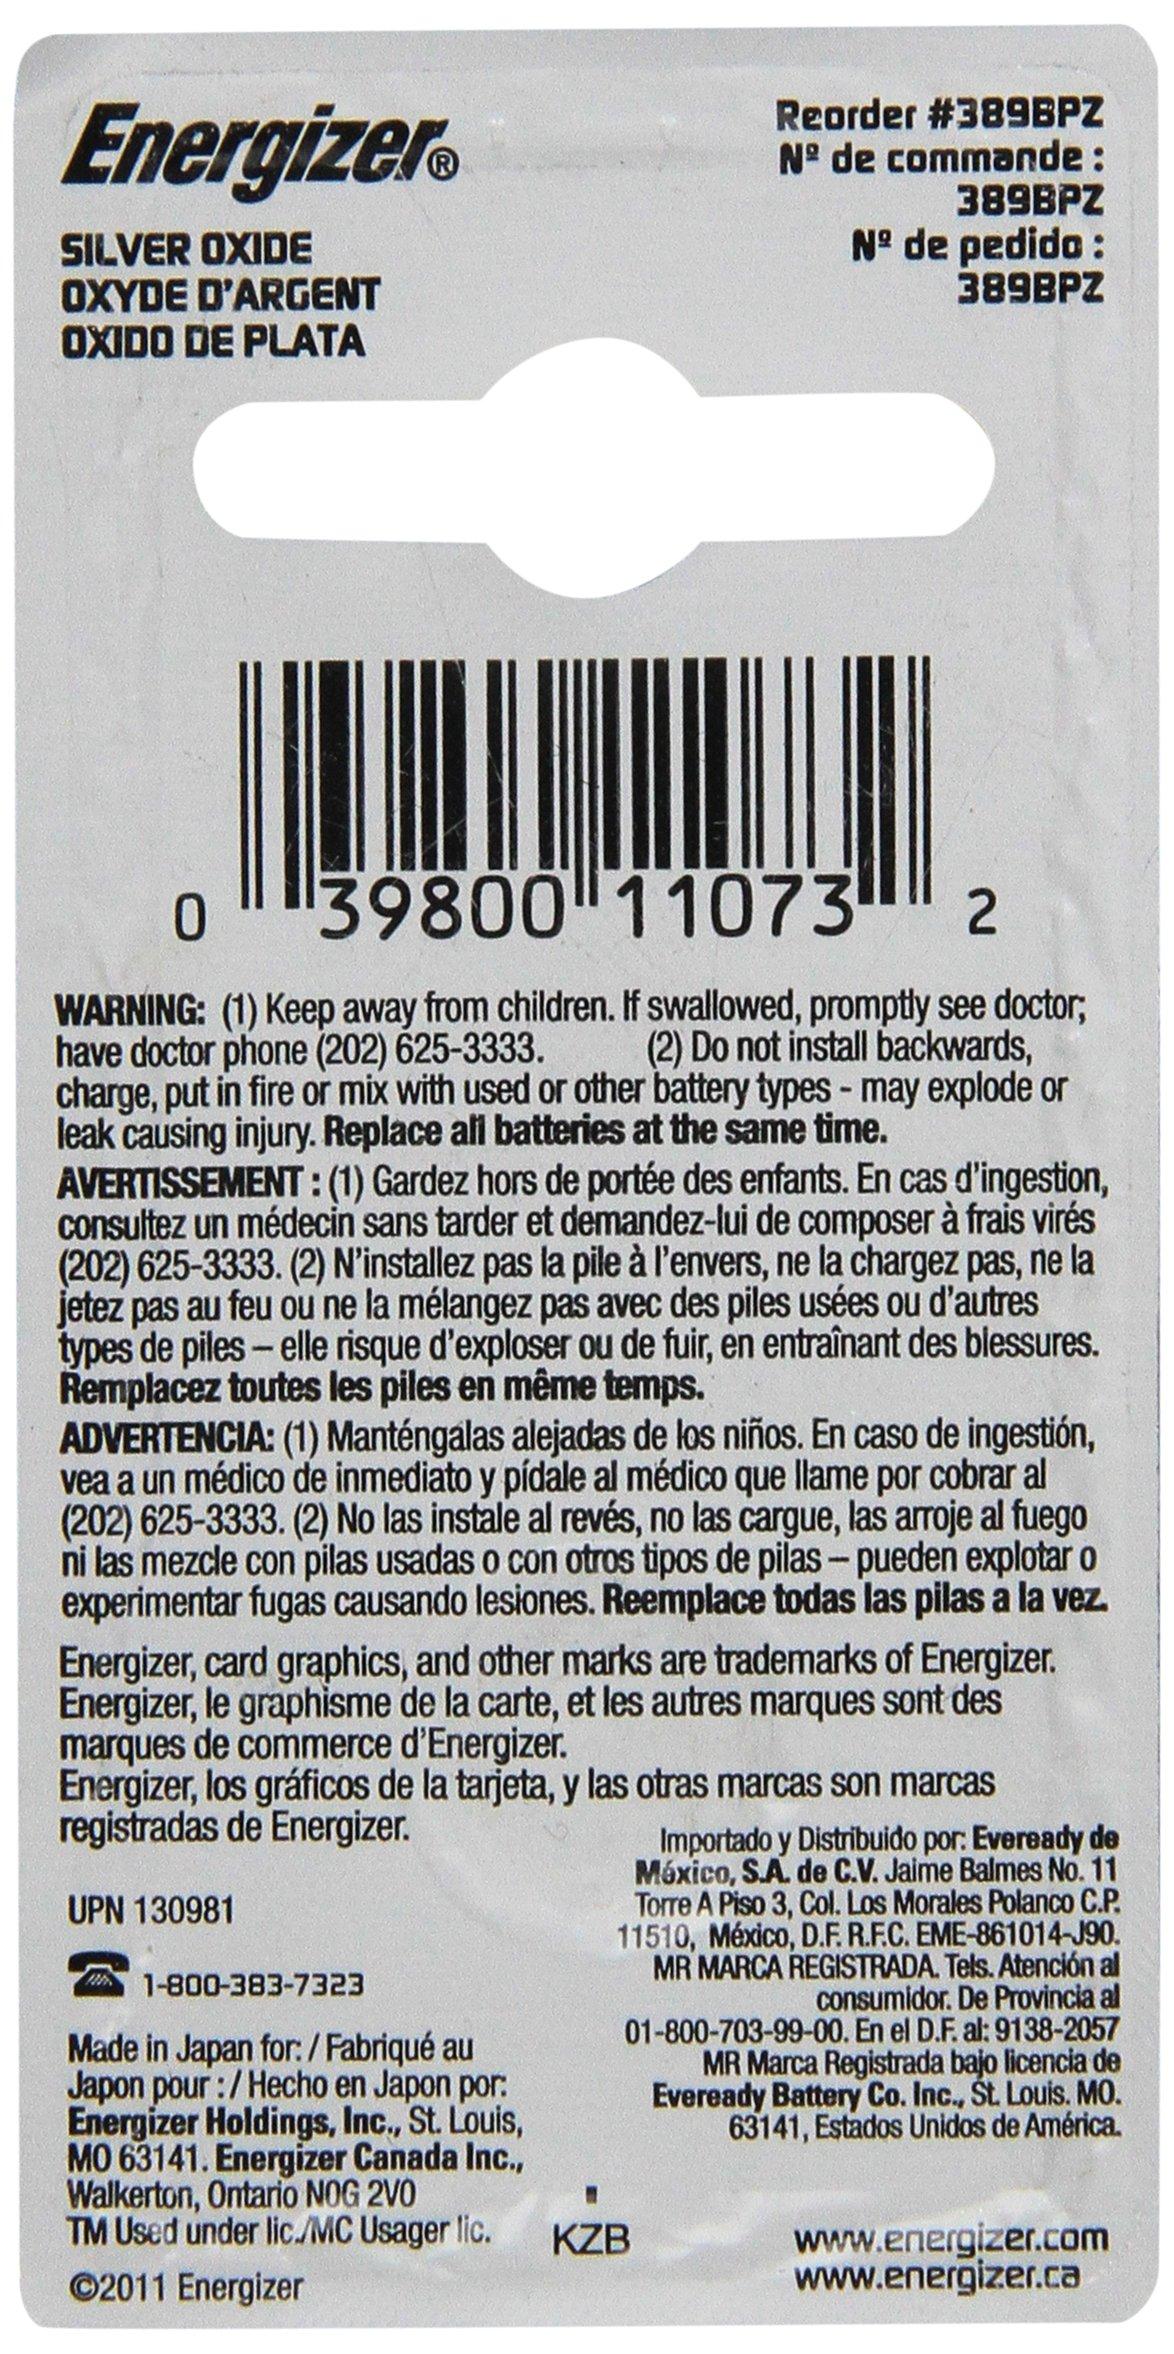 Energizer 389BPZ Zero Mercury Battery - - 1 Pack